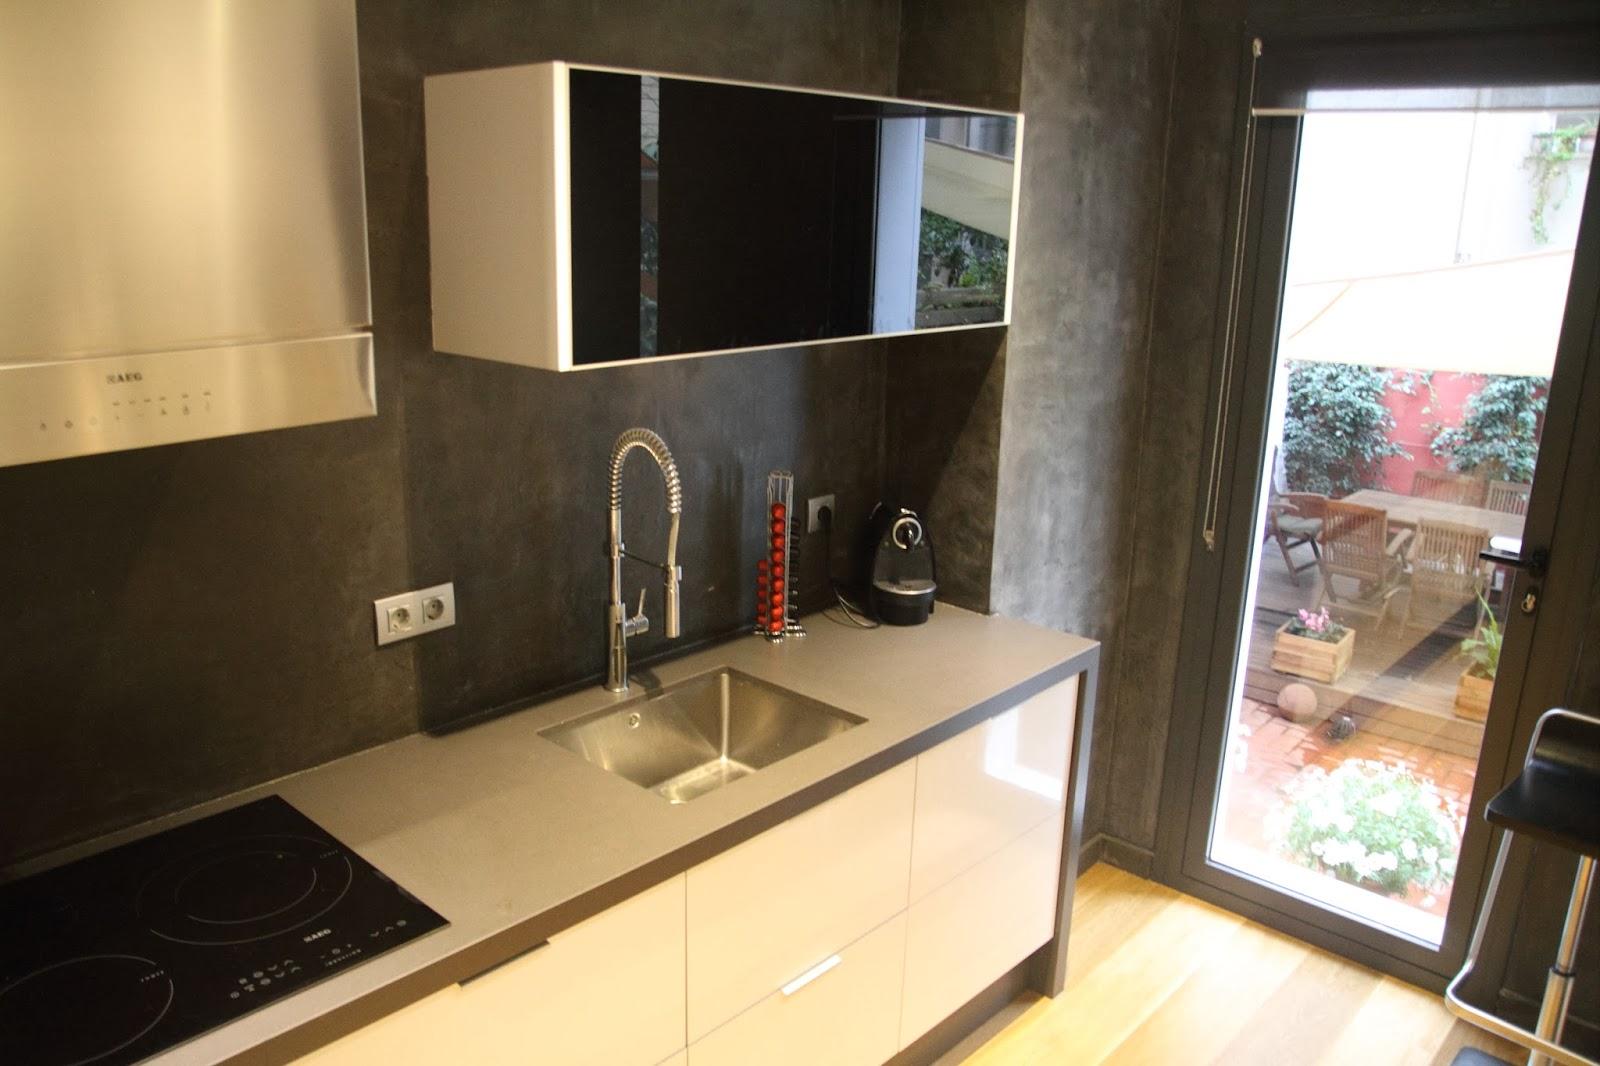 Federico centarti studio reforma integral vivienda 90 - Reforma piso completo barcelona ...